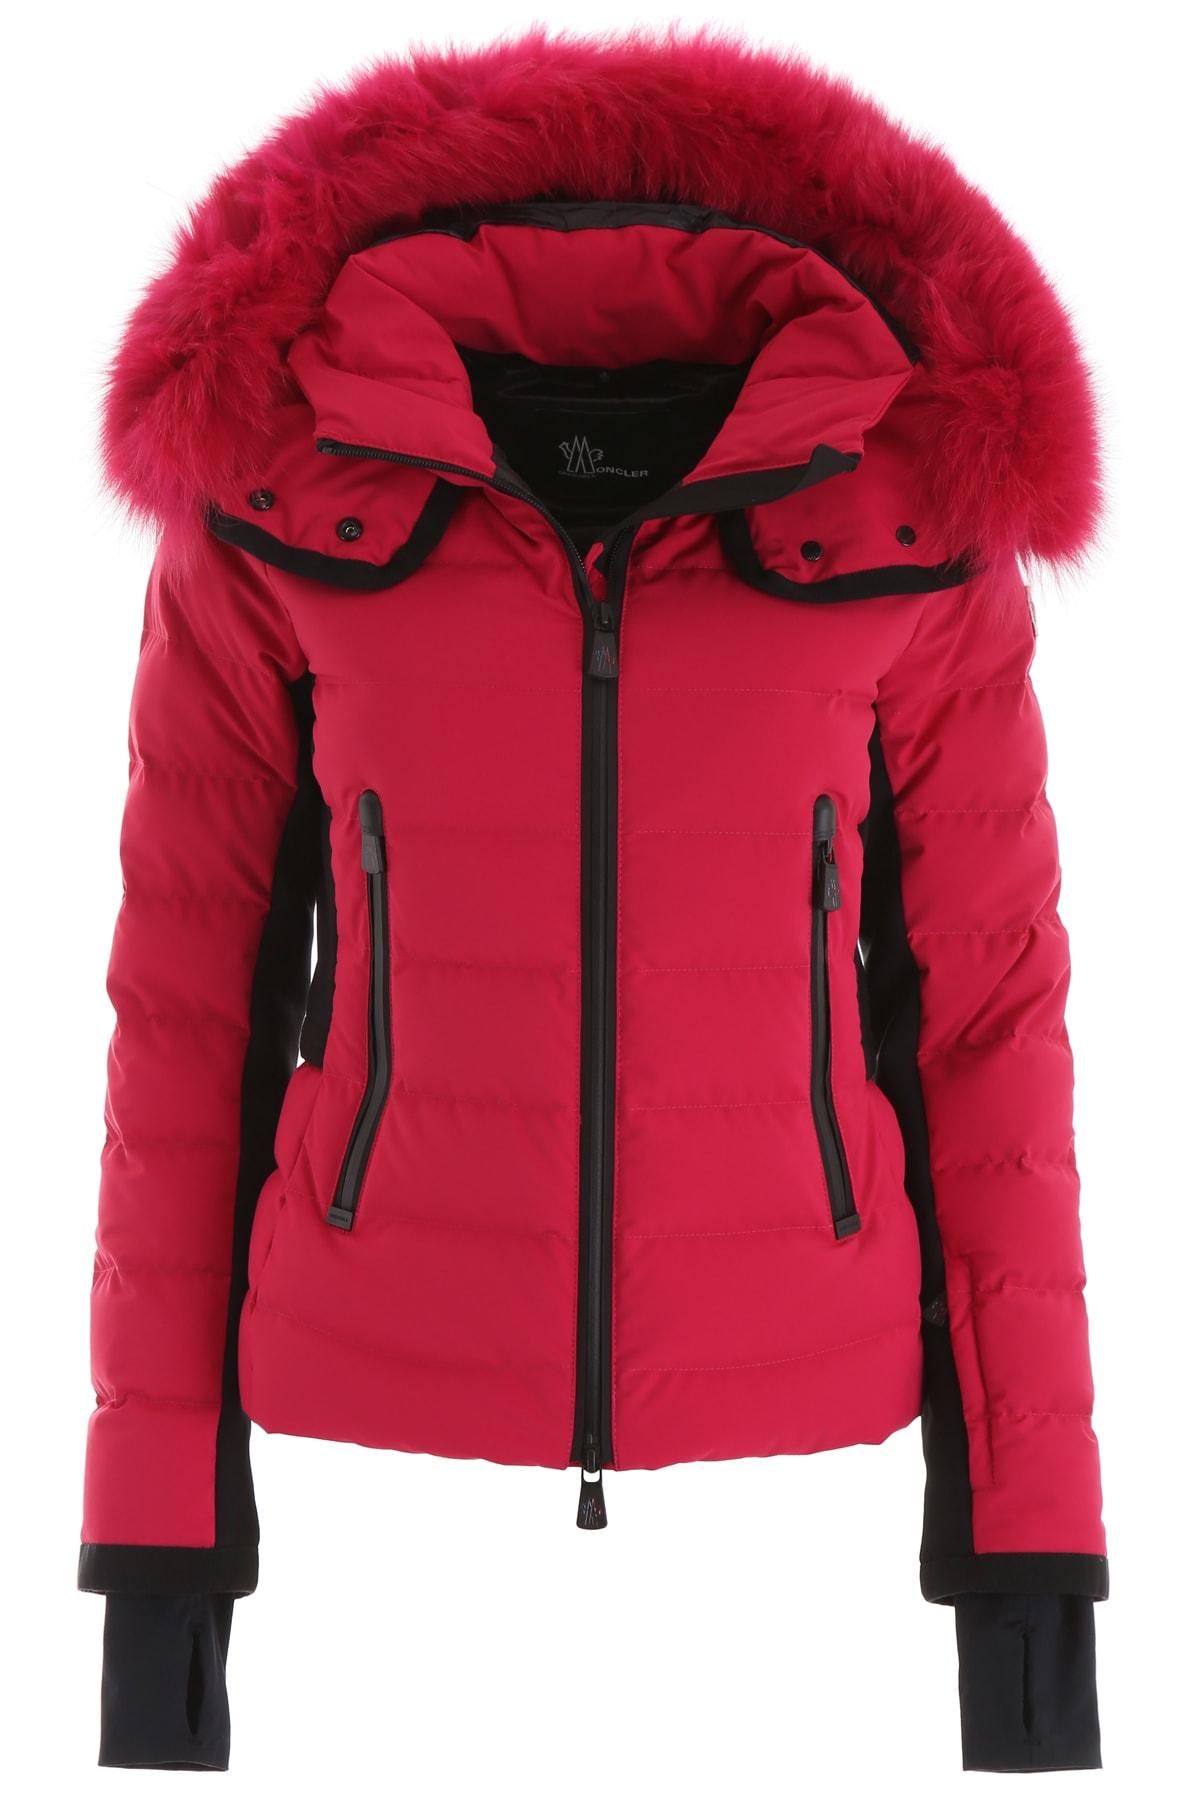 Moncler Grenoble Lamoura Puffer Jacket